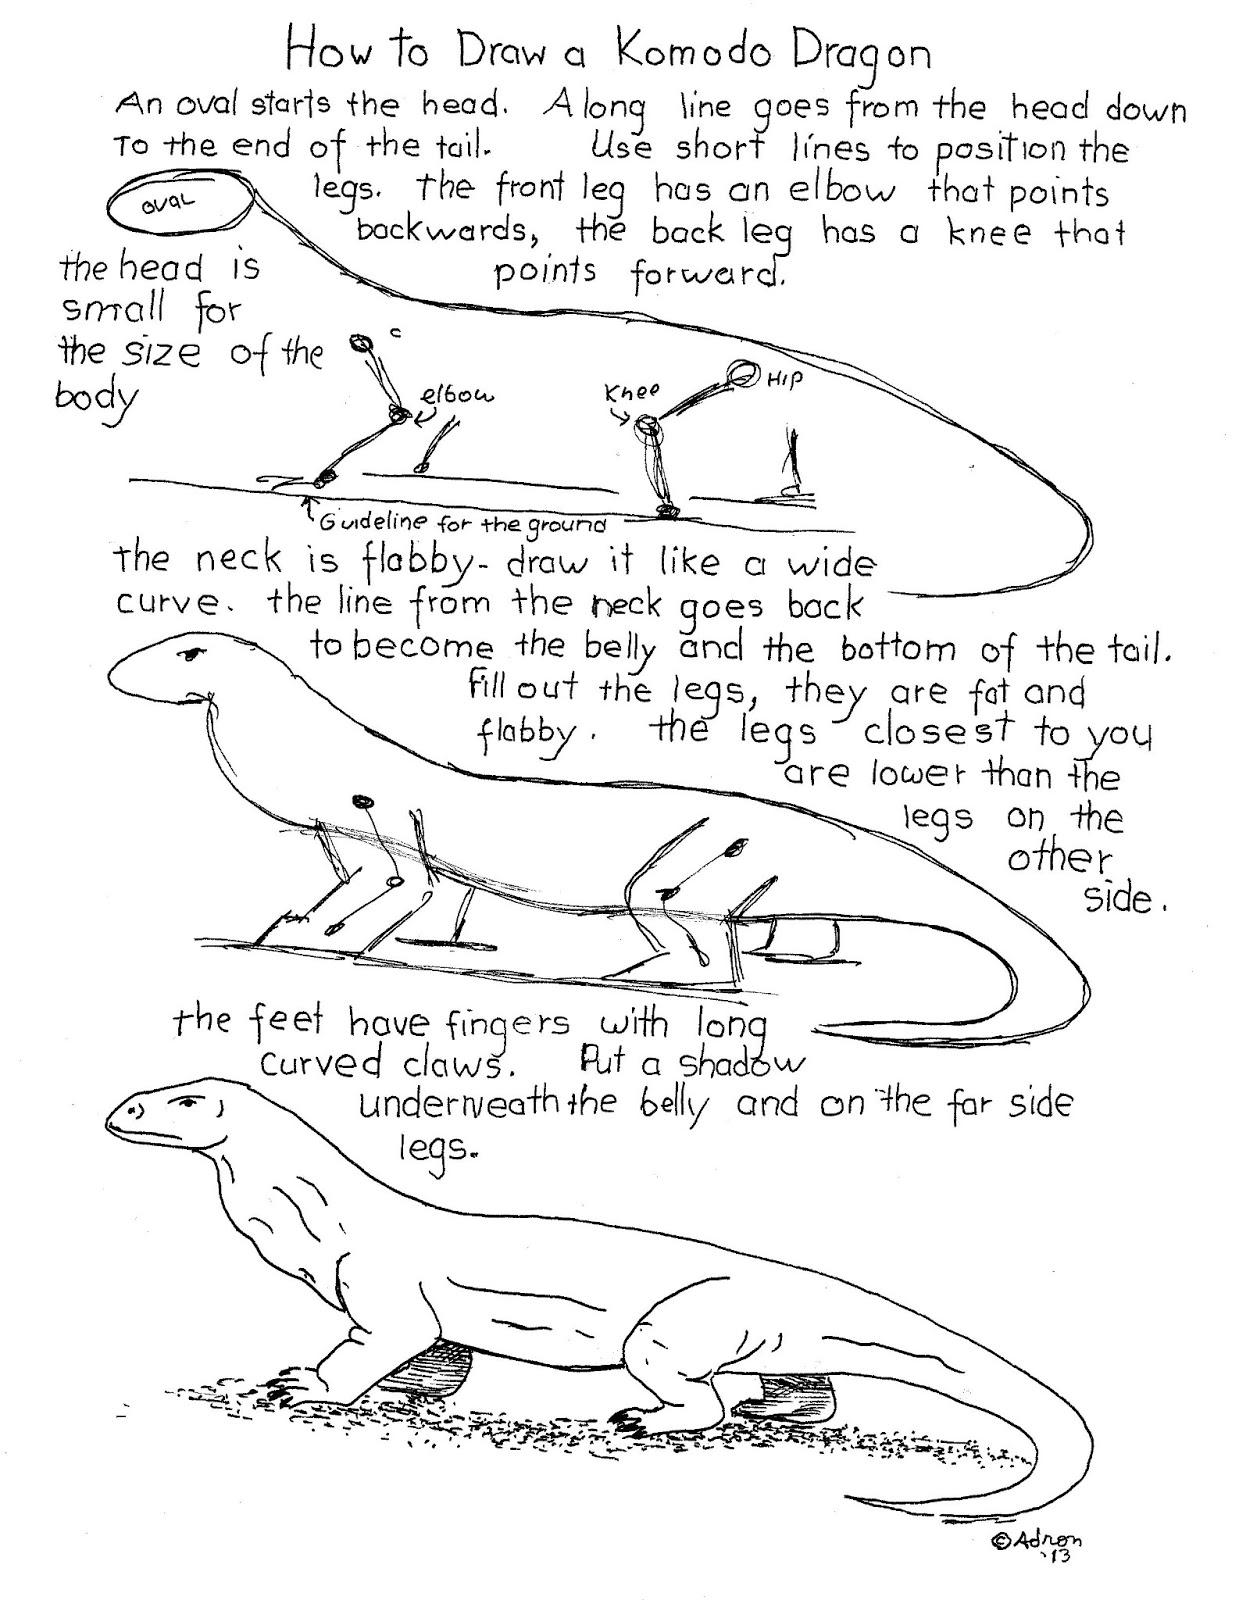 How To Draw A Komodo Dragon Worksheet